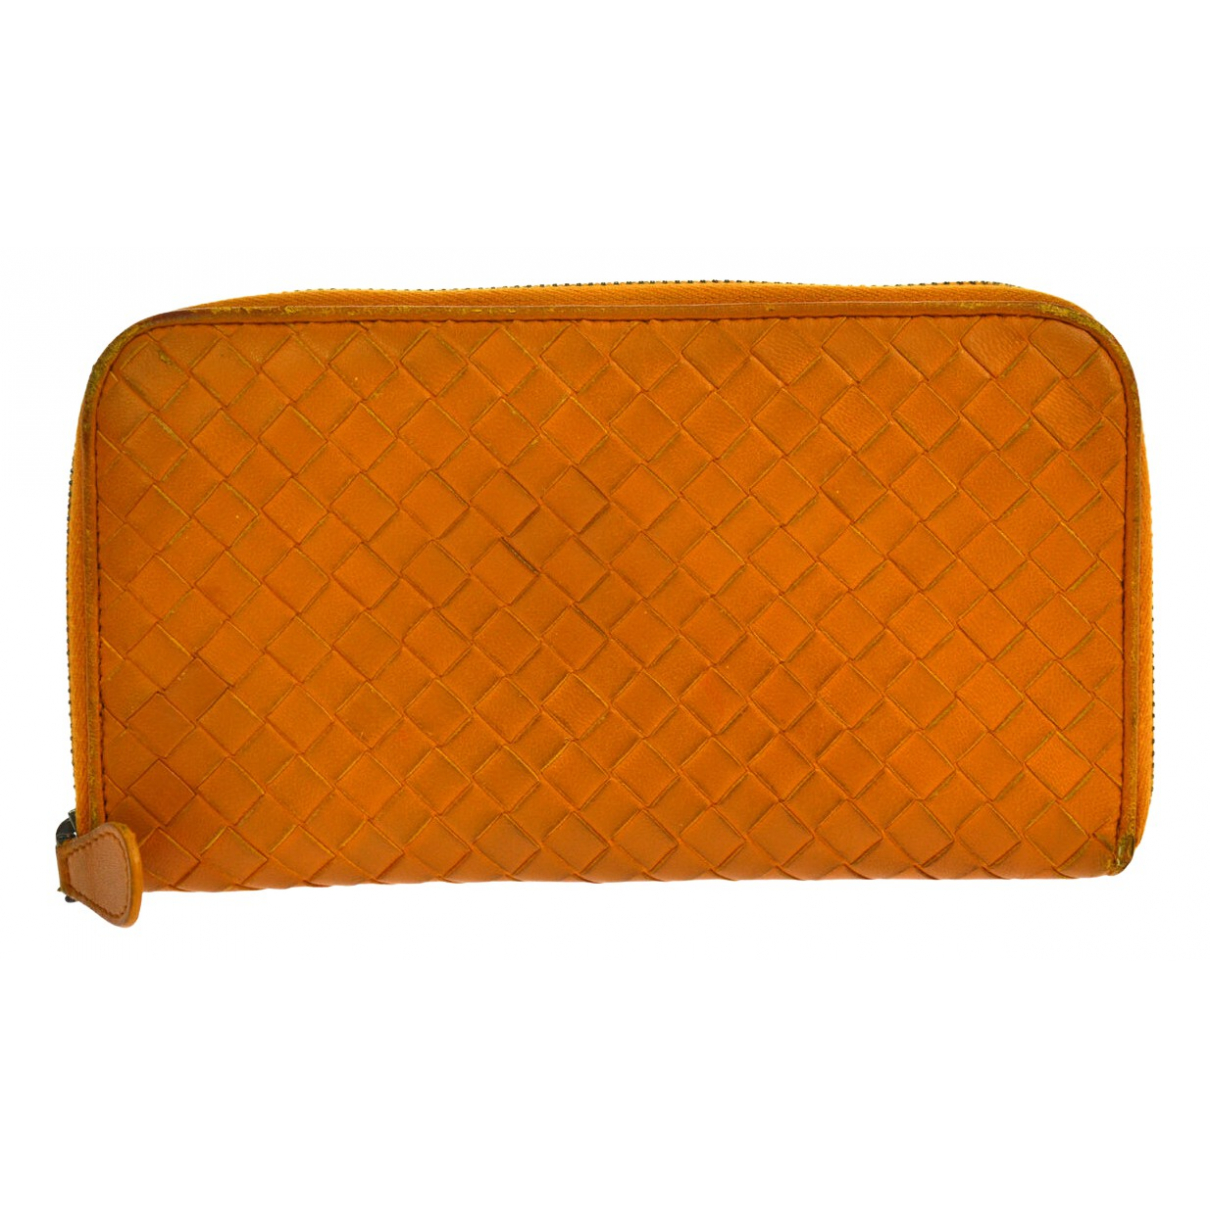 Bottega Veneta - Portefeuille Intrecciato pour femme en cuir - orange